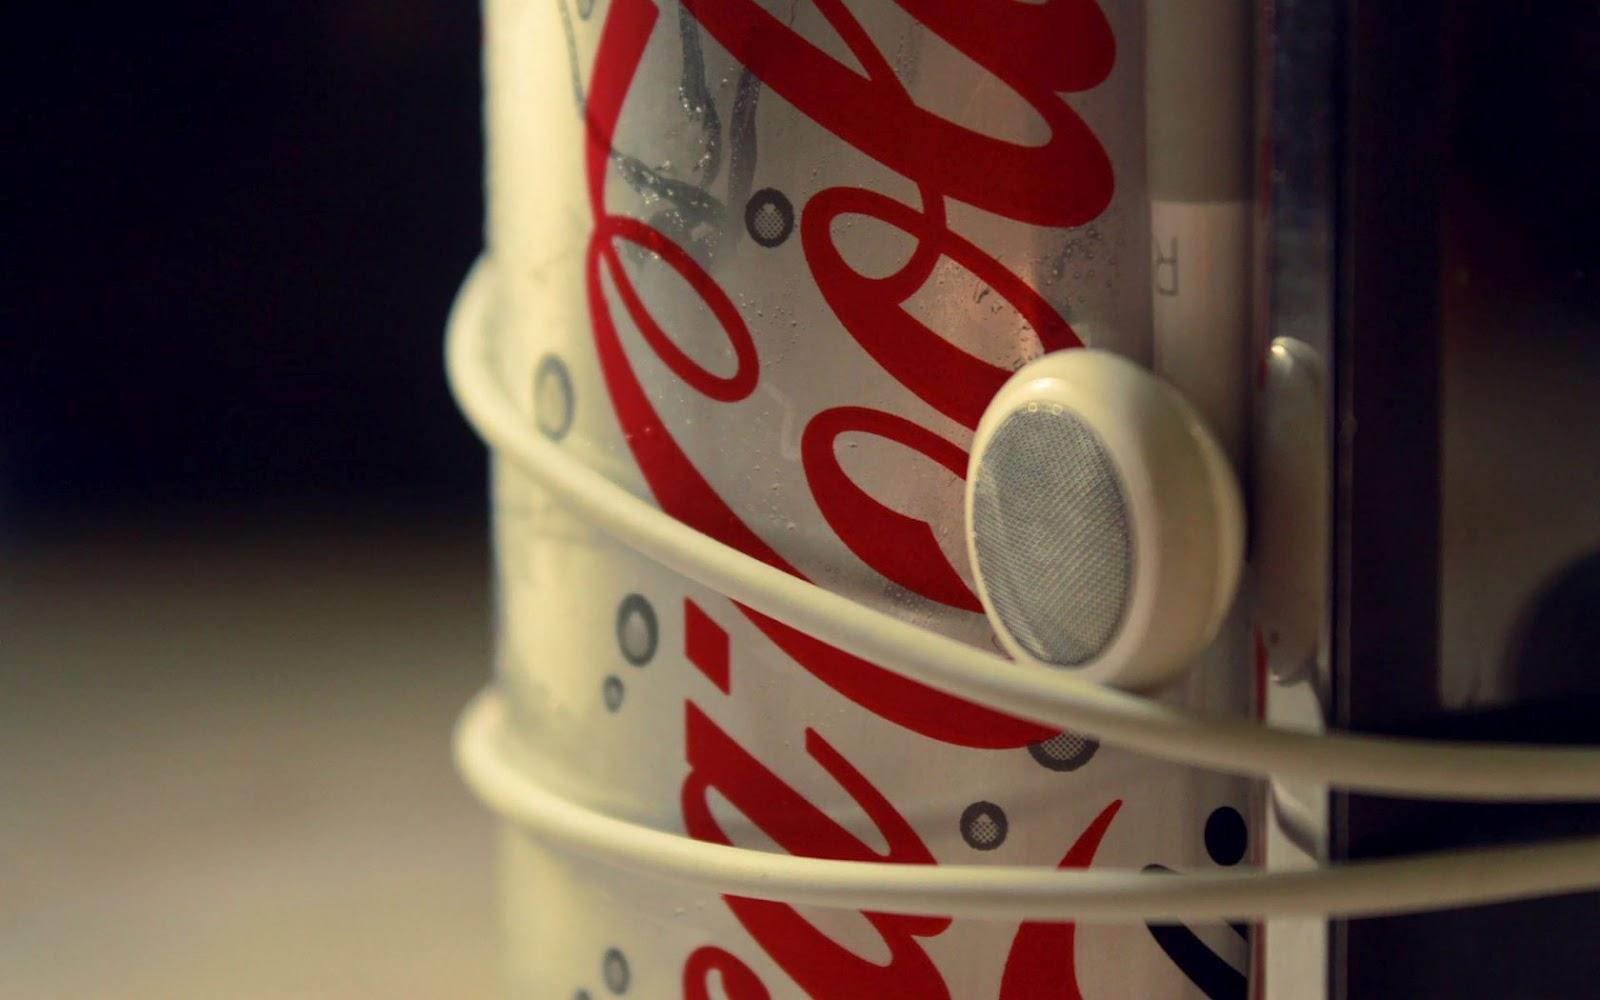 http://2.bp.blogspot.com/-te0UnOvgEfk/T846r4sXqkI/AAAAAAAAB9o/gocK_H8s9Ws/s1600/Coca_Cola_Light_Can_and_iPhone_Headphone_HD_Desktop_Wallpaper.jpg